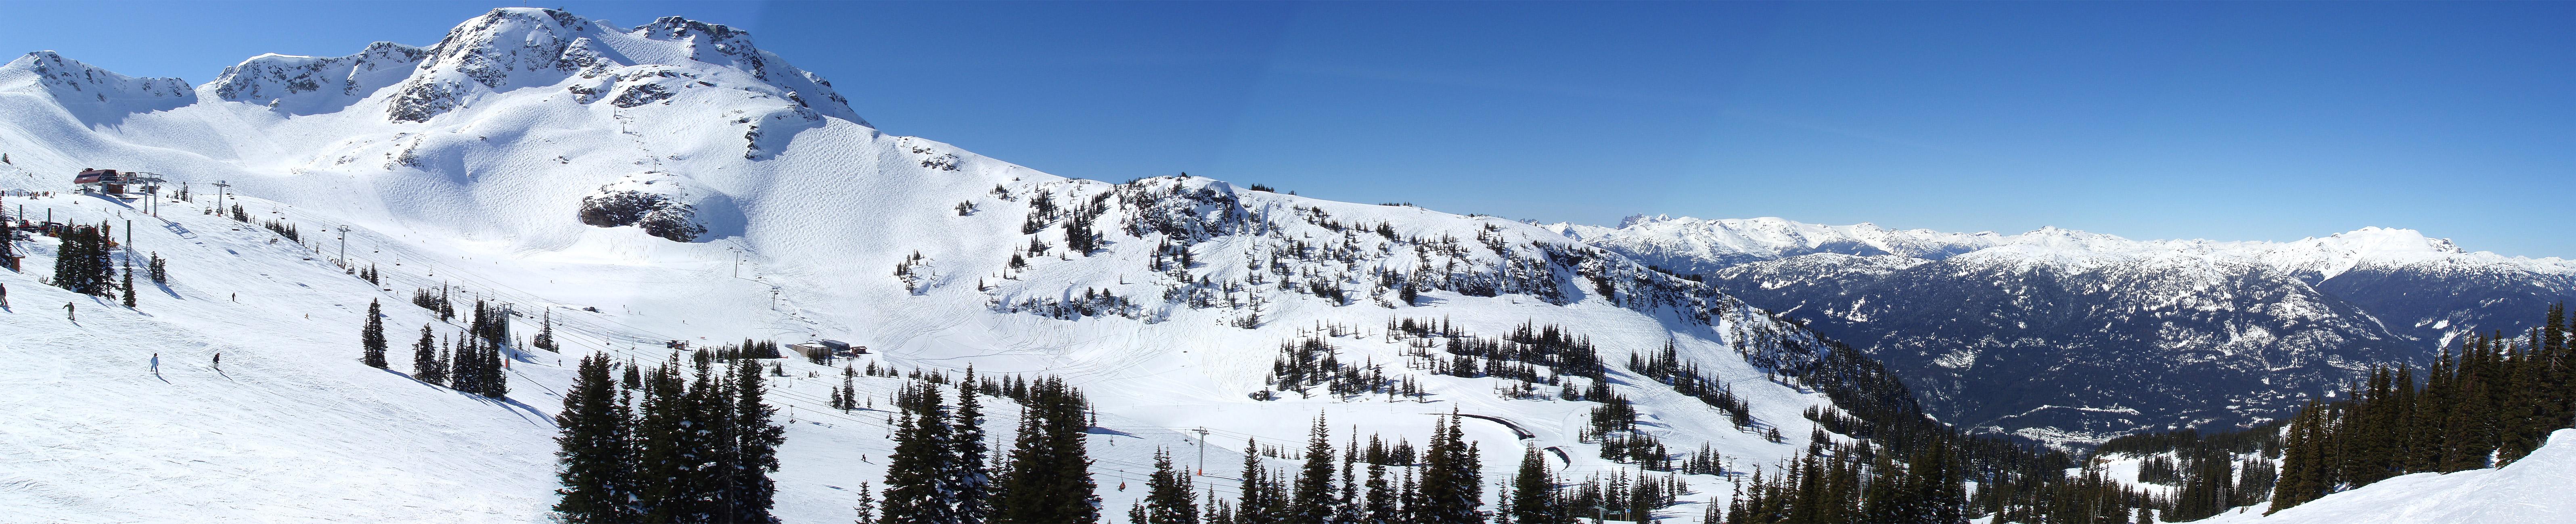 Whistler ski resort image wikimedia